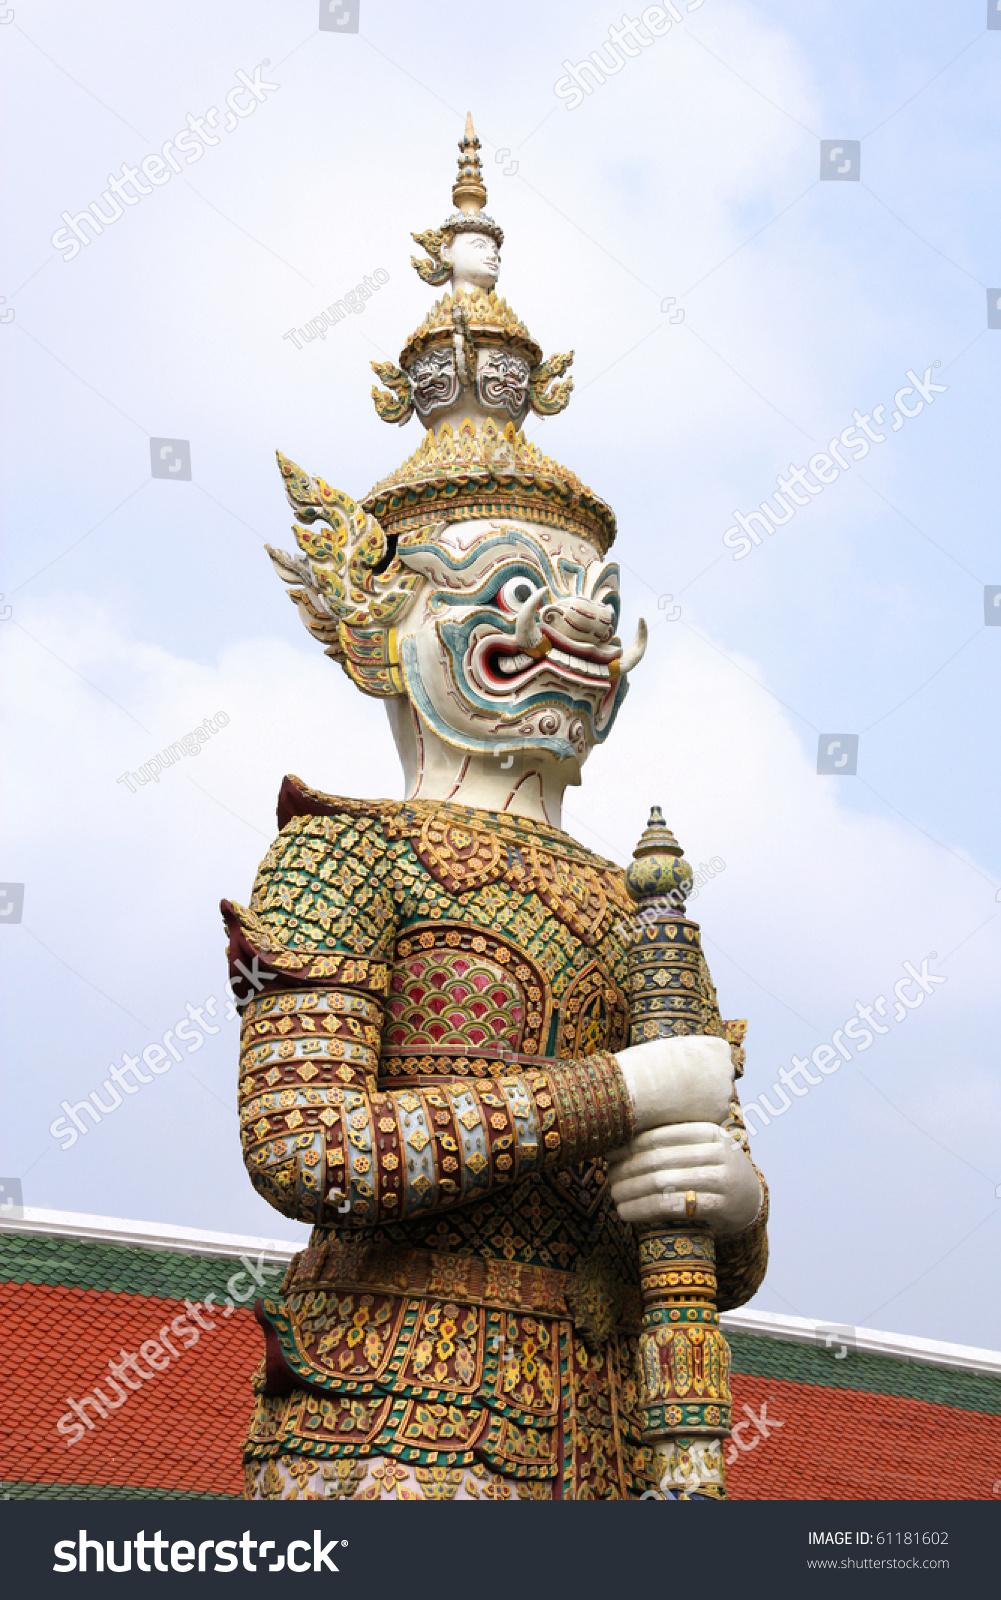 Thai Guard Statue - Beautiful Sculpture In The Royal Grand ...